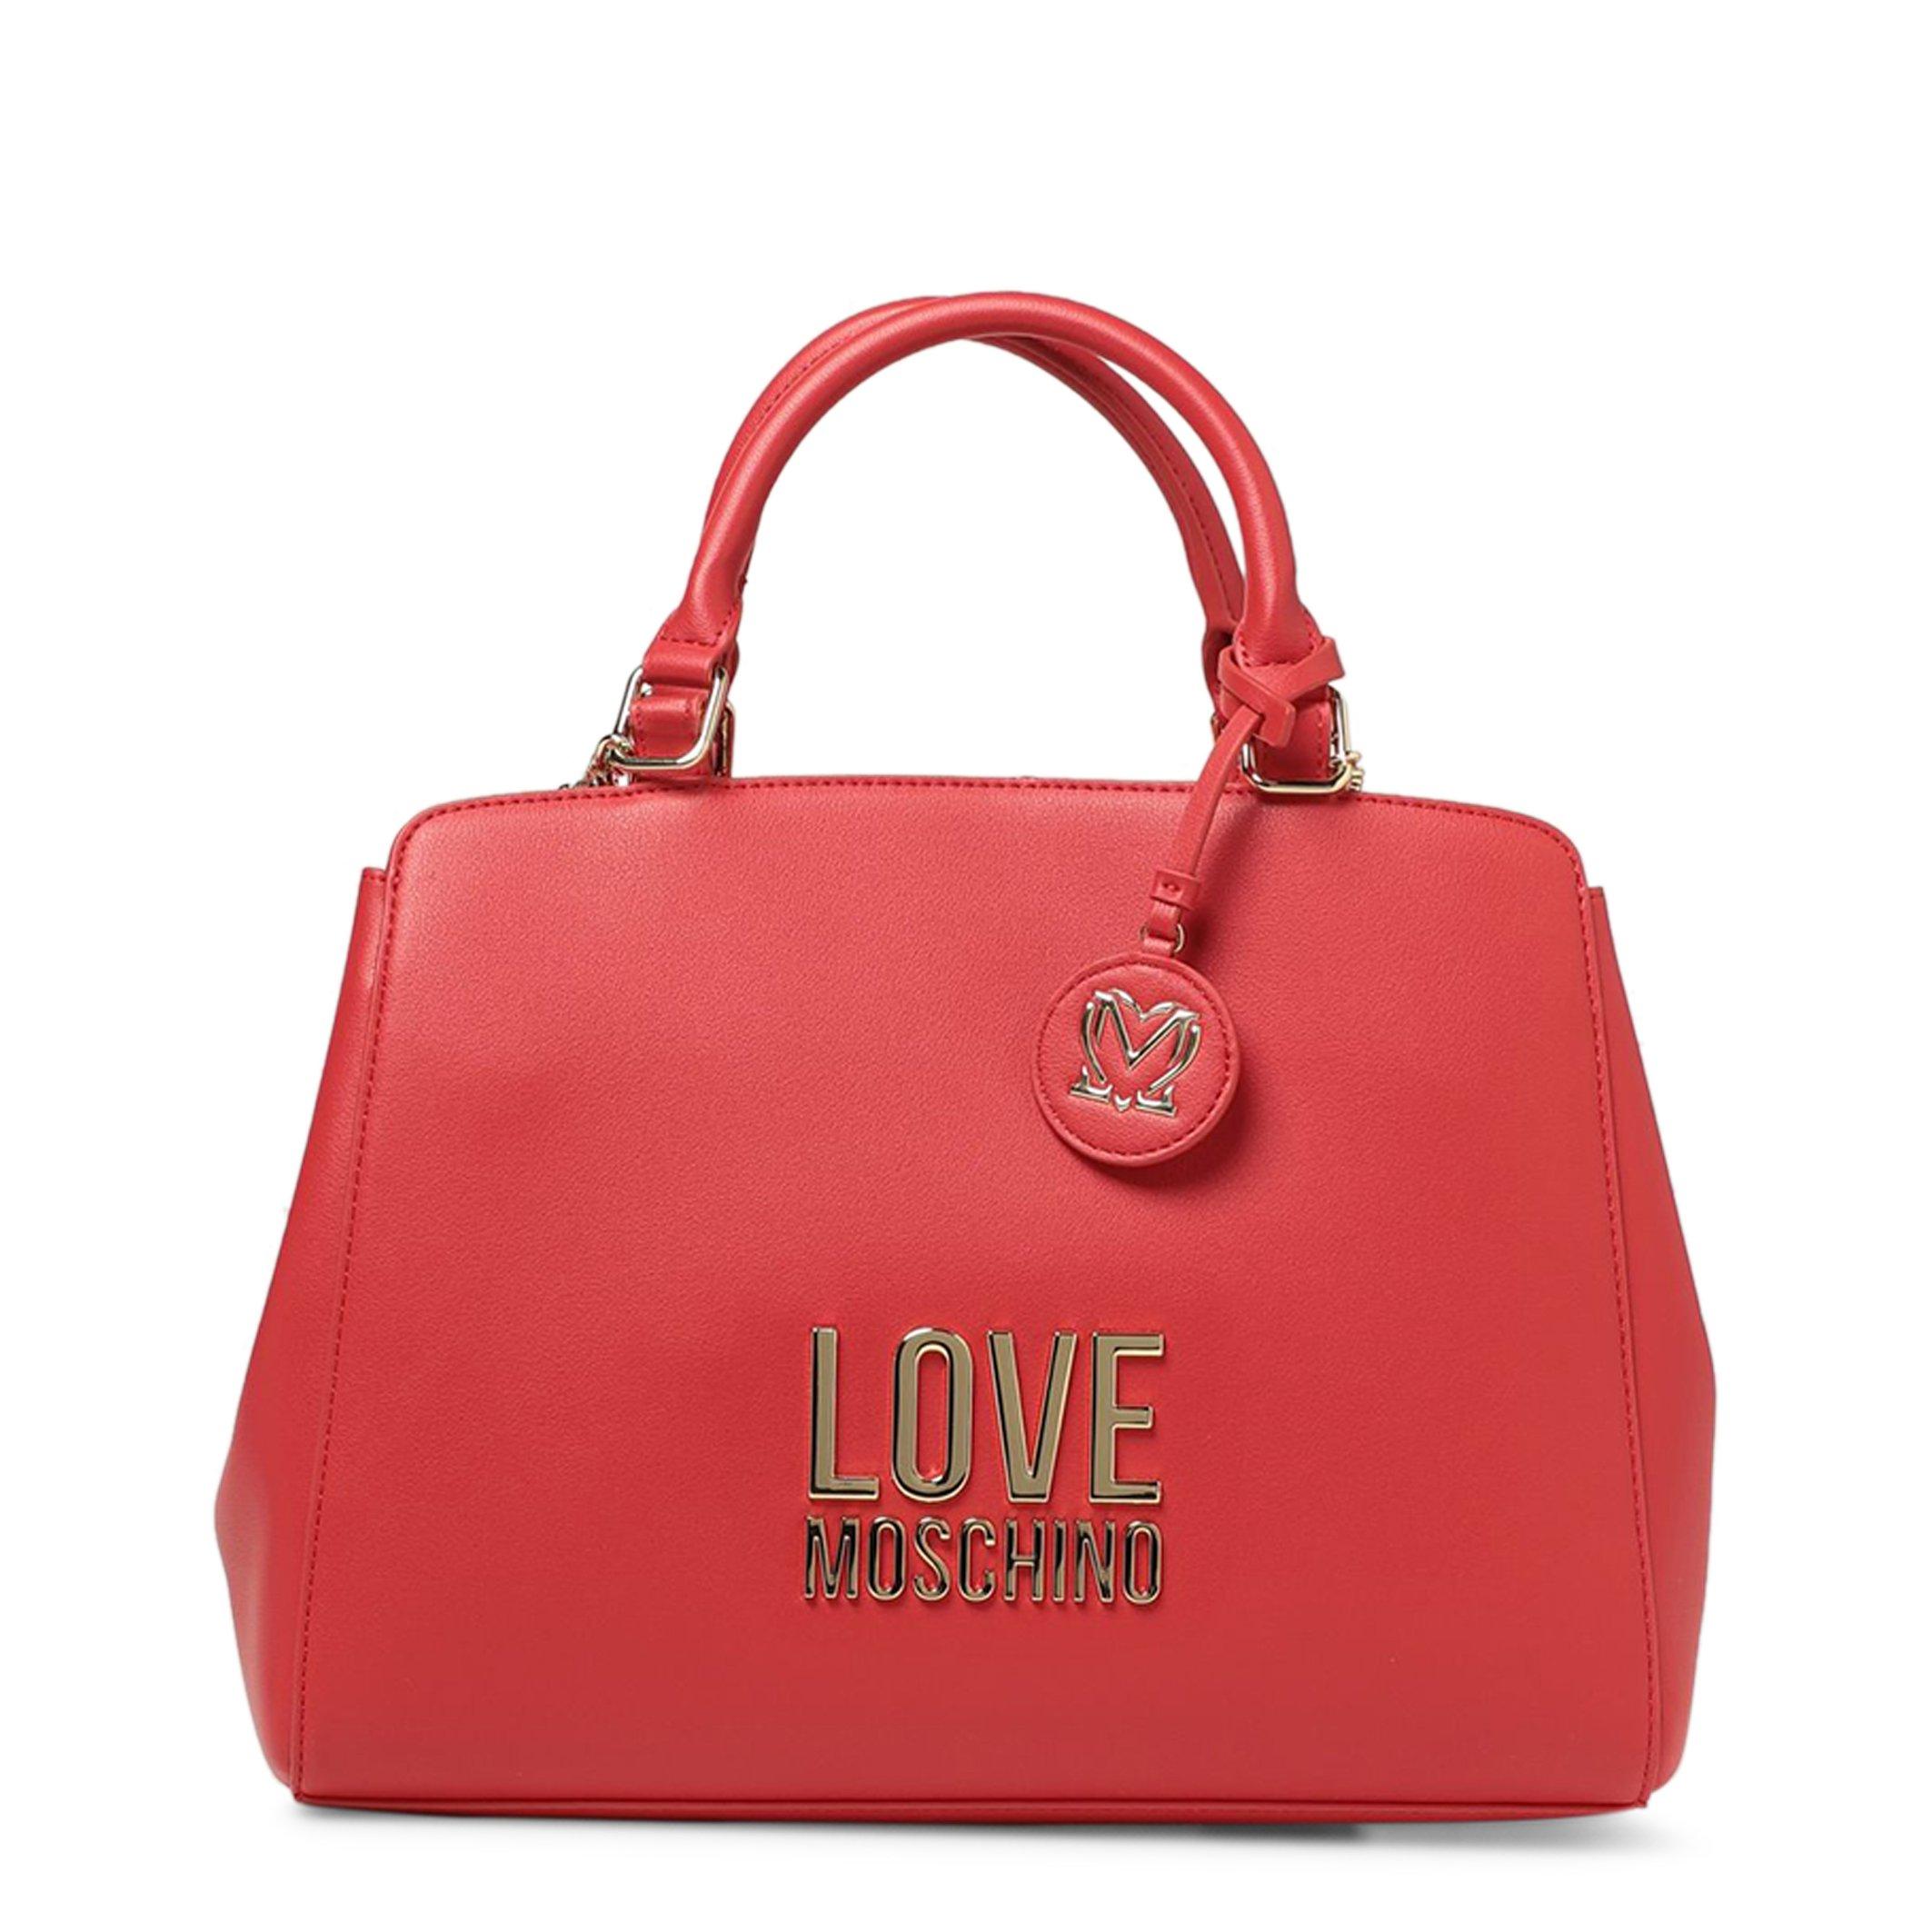 Love Moschino Women's Shoulder Bag Various Colours JC4192PP1DLJ0 - red NOSIZE